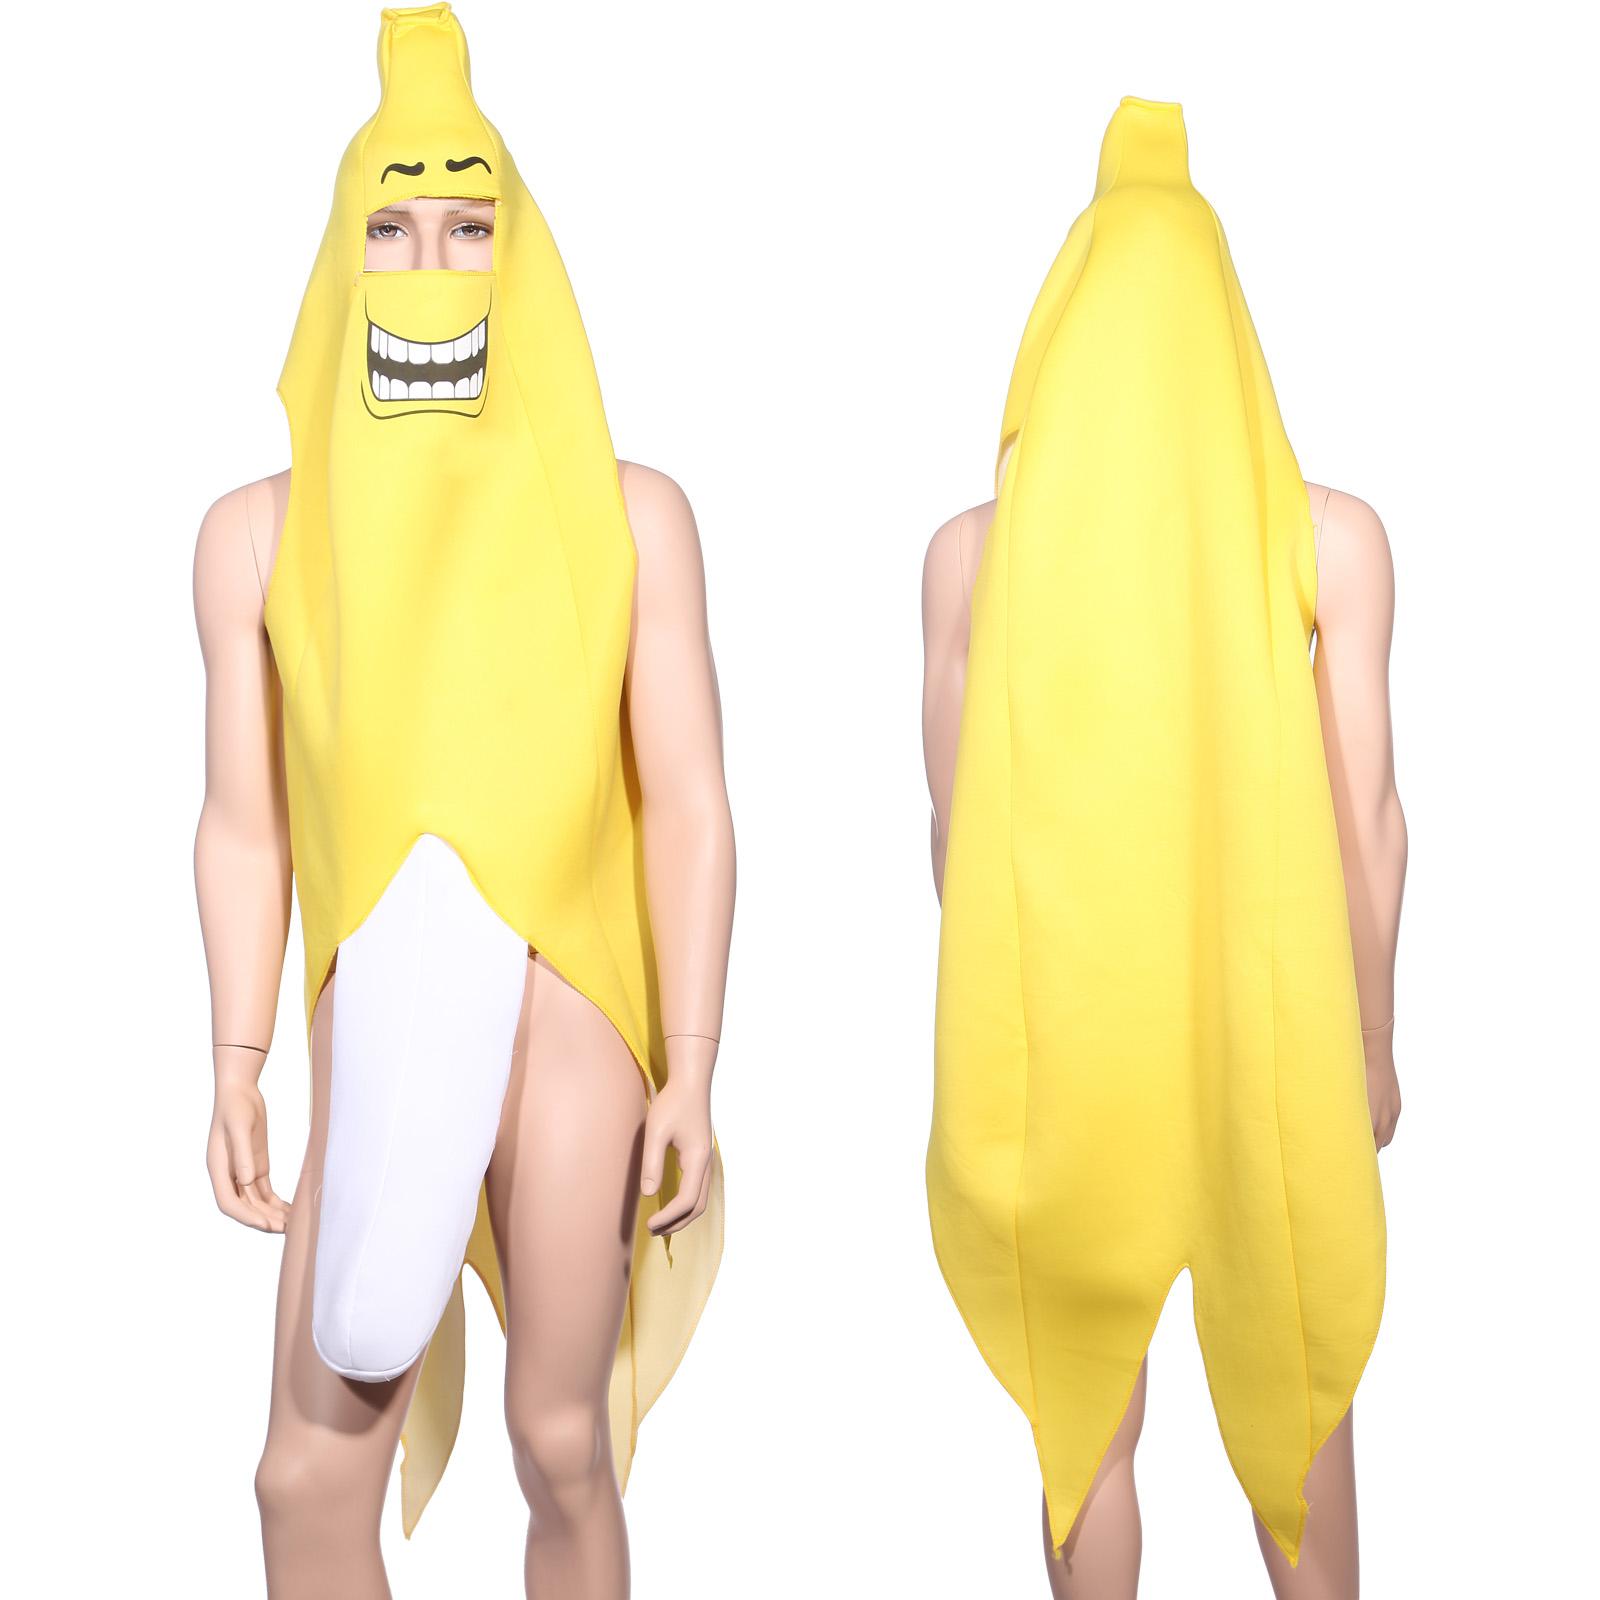 Adult Banana Split Costume Fancy Dress Bachelor Fruit Stag do Party ...: ebay.com/itm/adult-banana-split-costume-fancy-dress-bachelor-fruit...